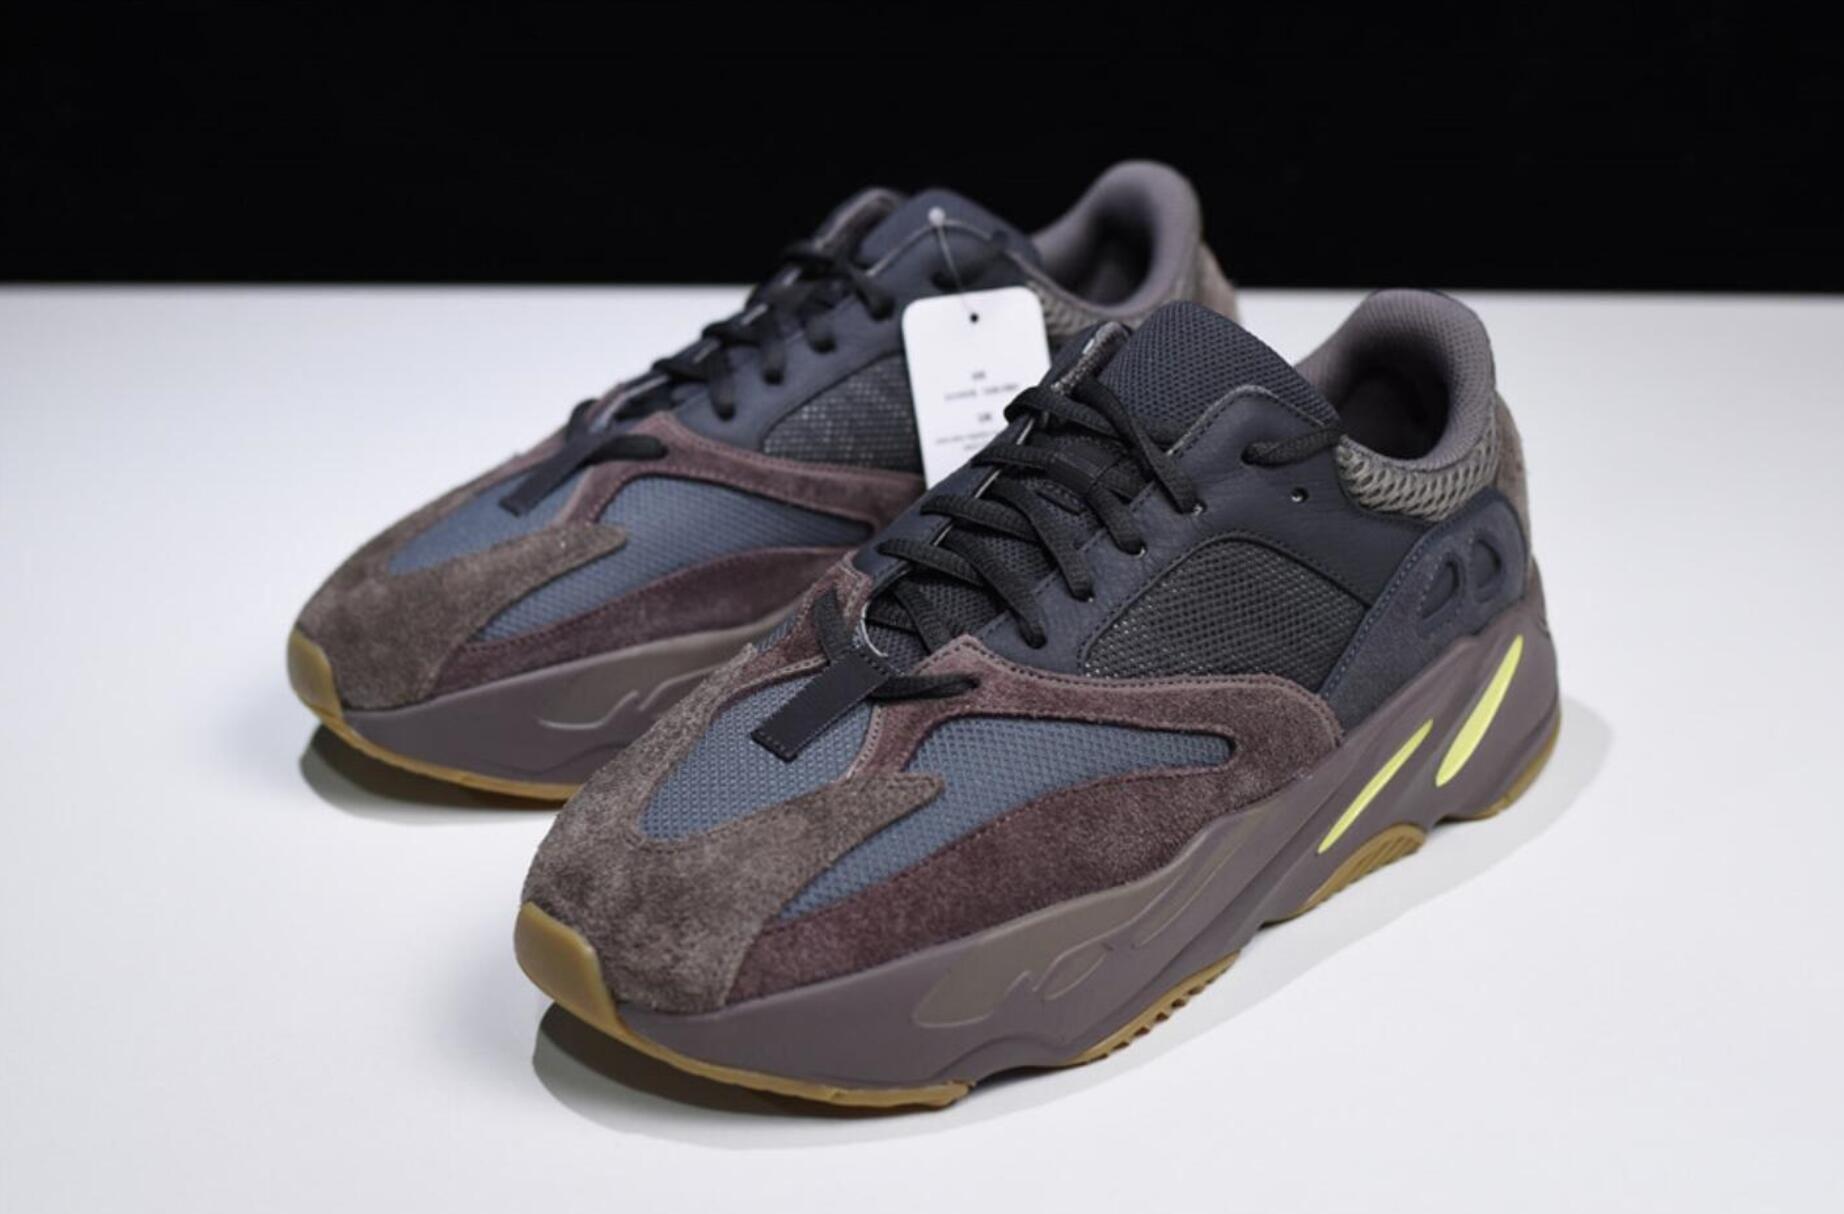 separation shoes 2c976 a10e0 700 Wave Runner womens sandals New 700 mauve shoes fashion mens shoes wave  700 West sneakers womens 2019 boots